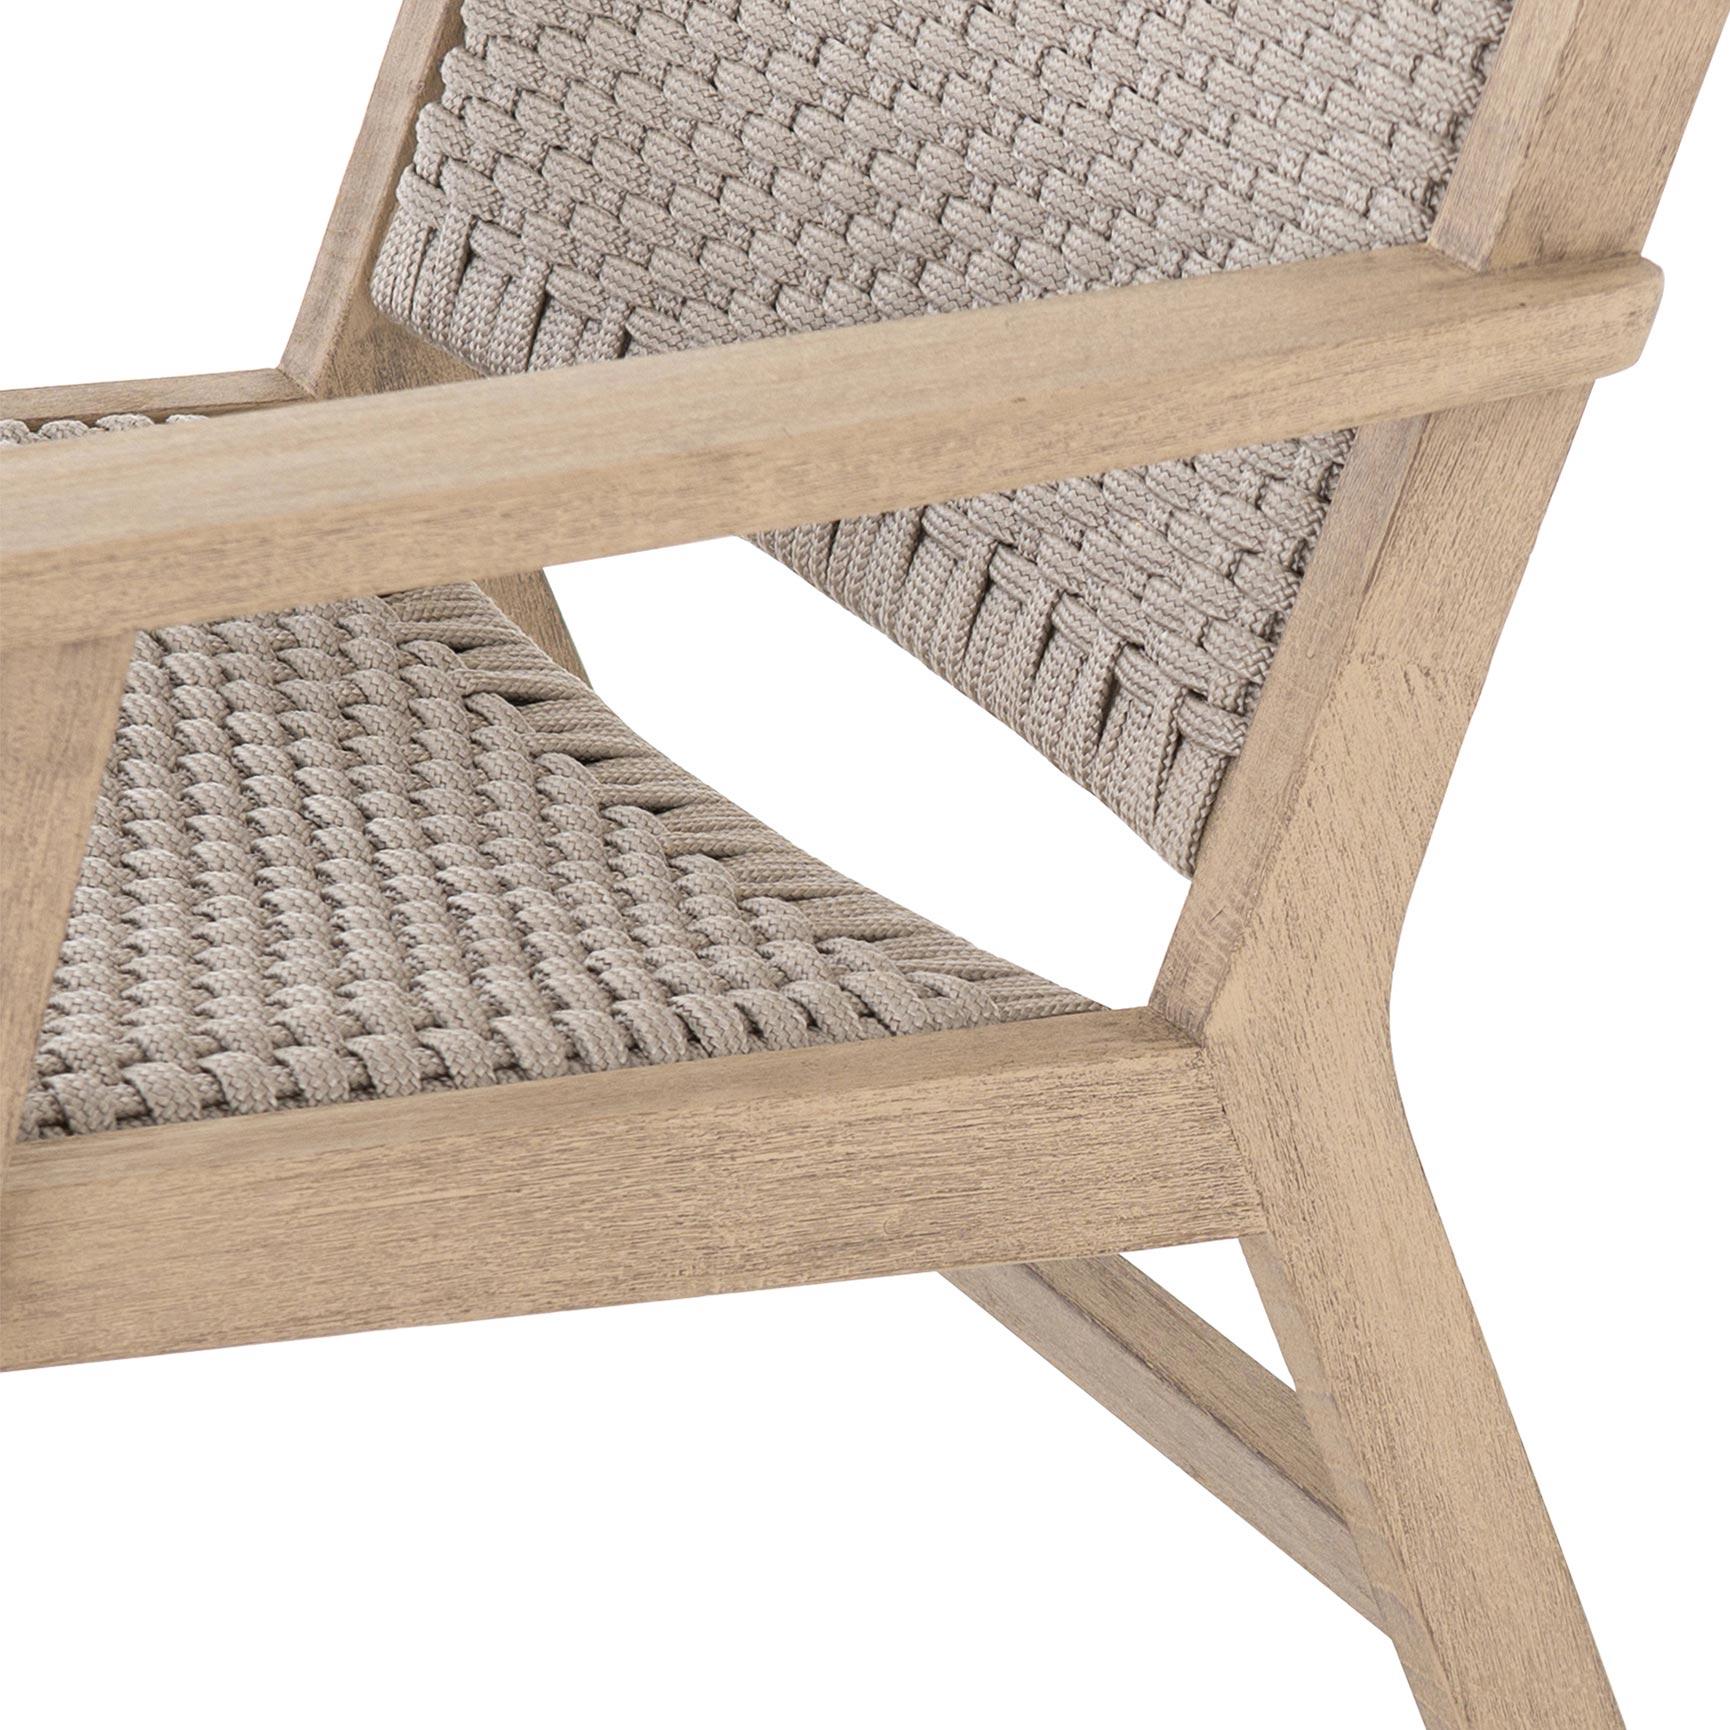 Udo Coastal Beach Grey Handwoven Rope Seat Brown Teak Outdoor Armchair